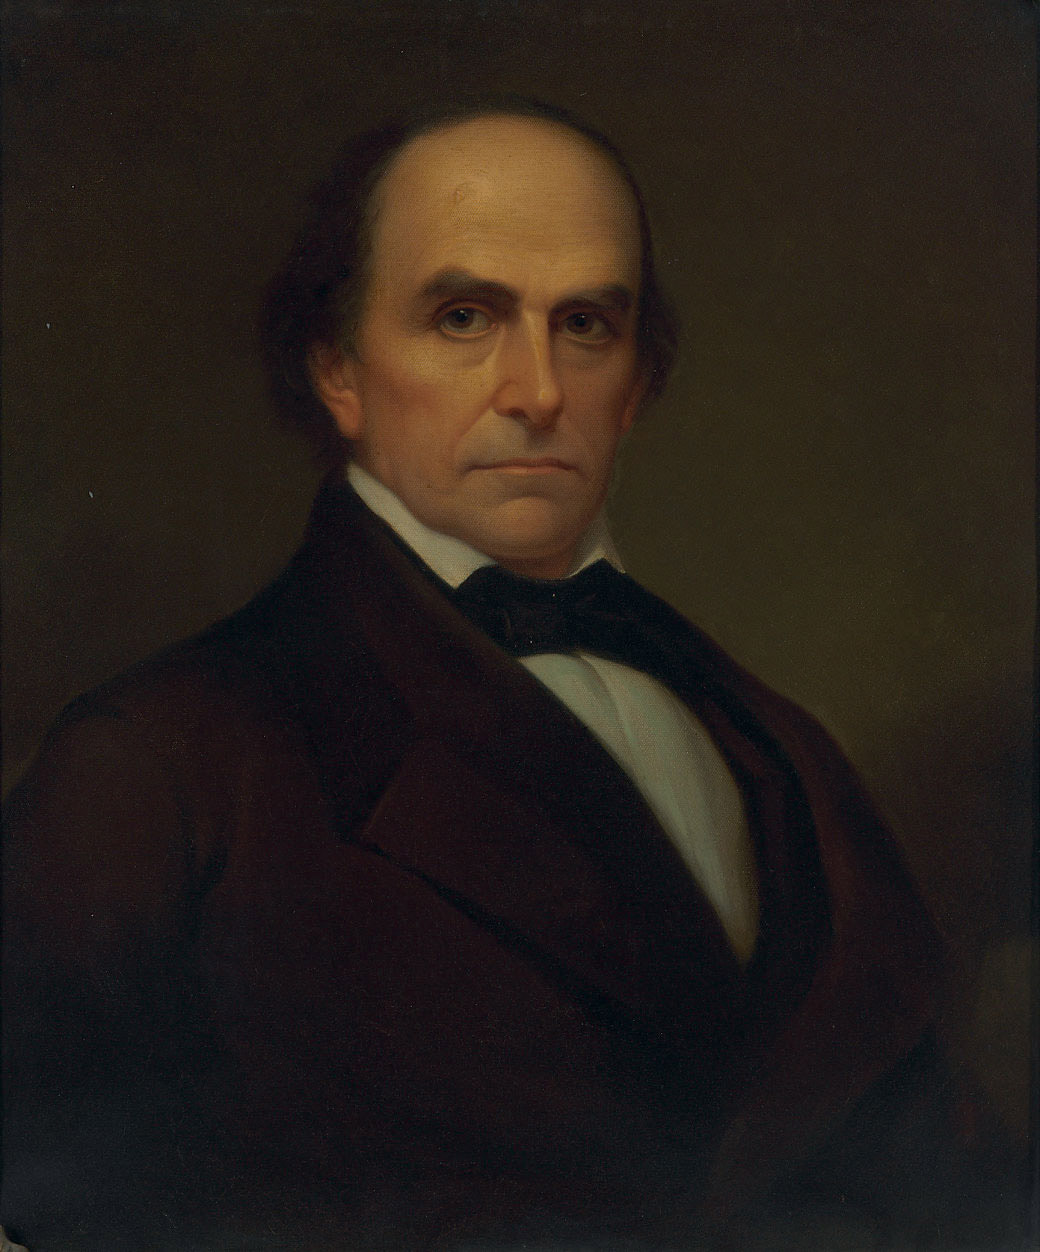 Portrait of Daniel Webster